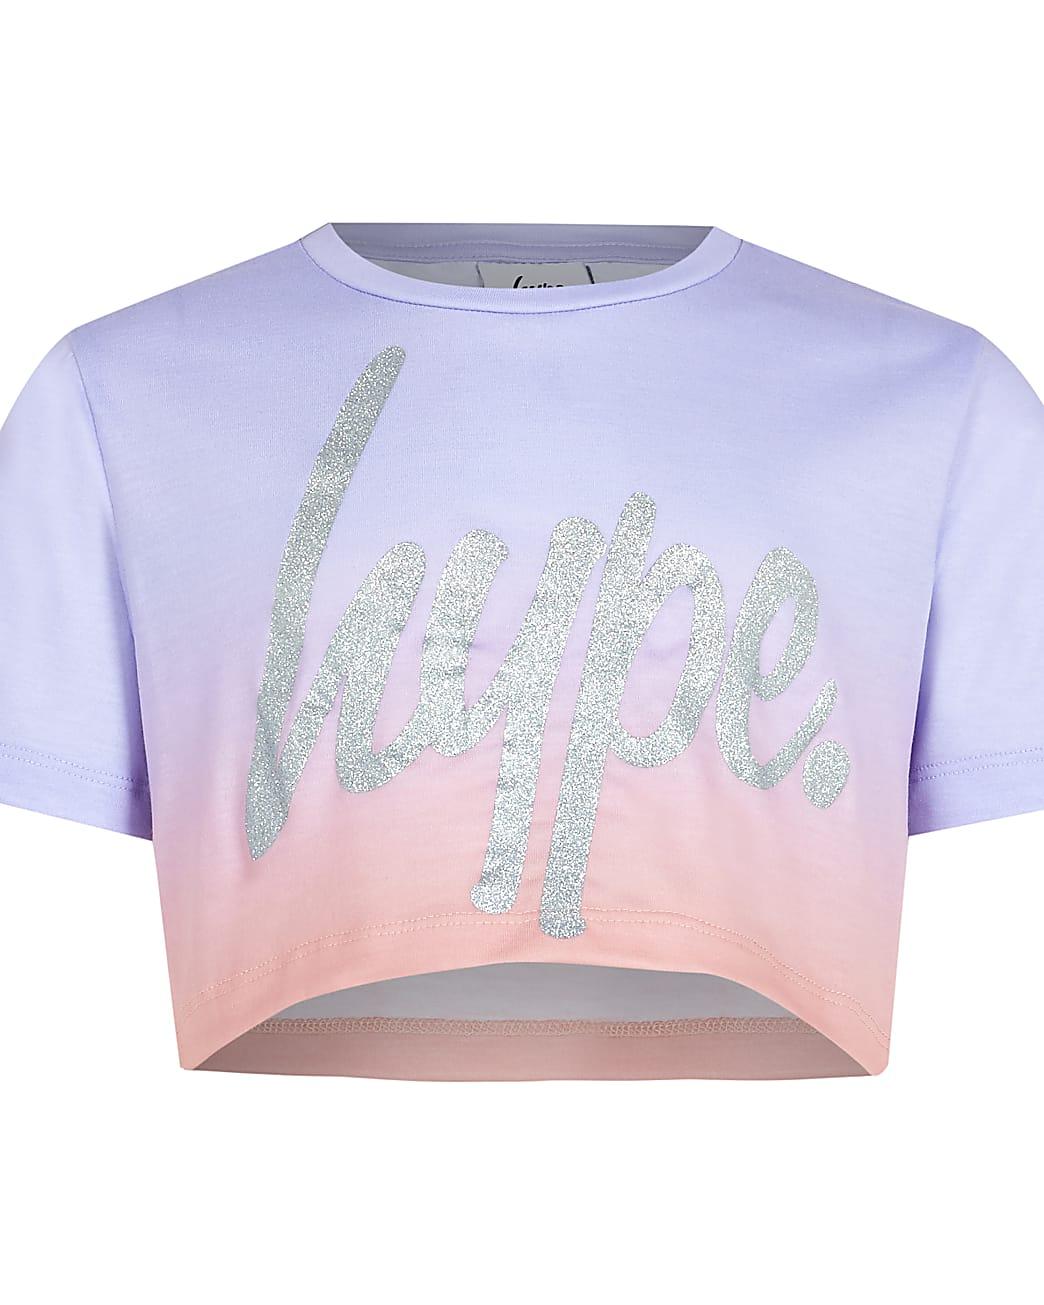 Girls Hype purple ombre fade crop top